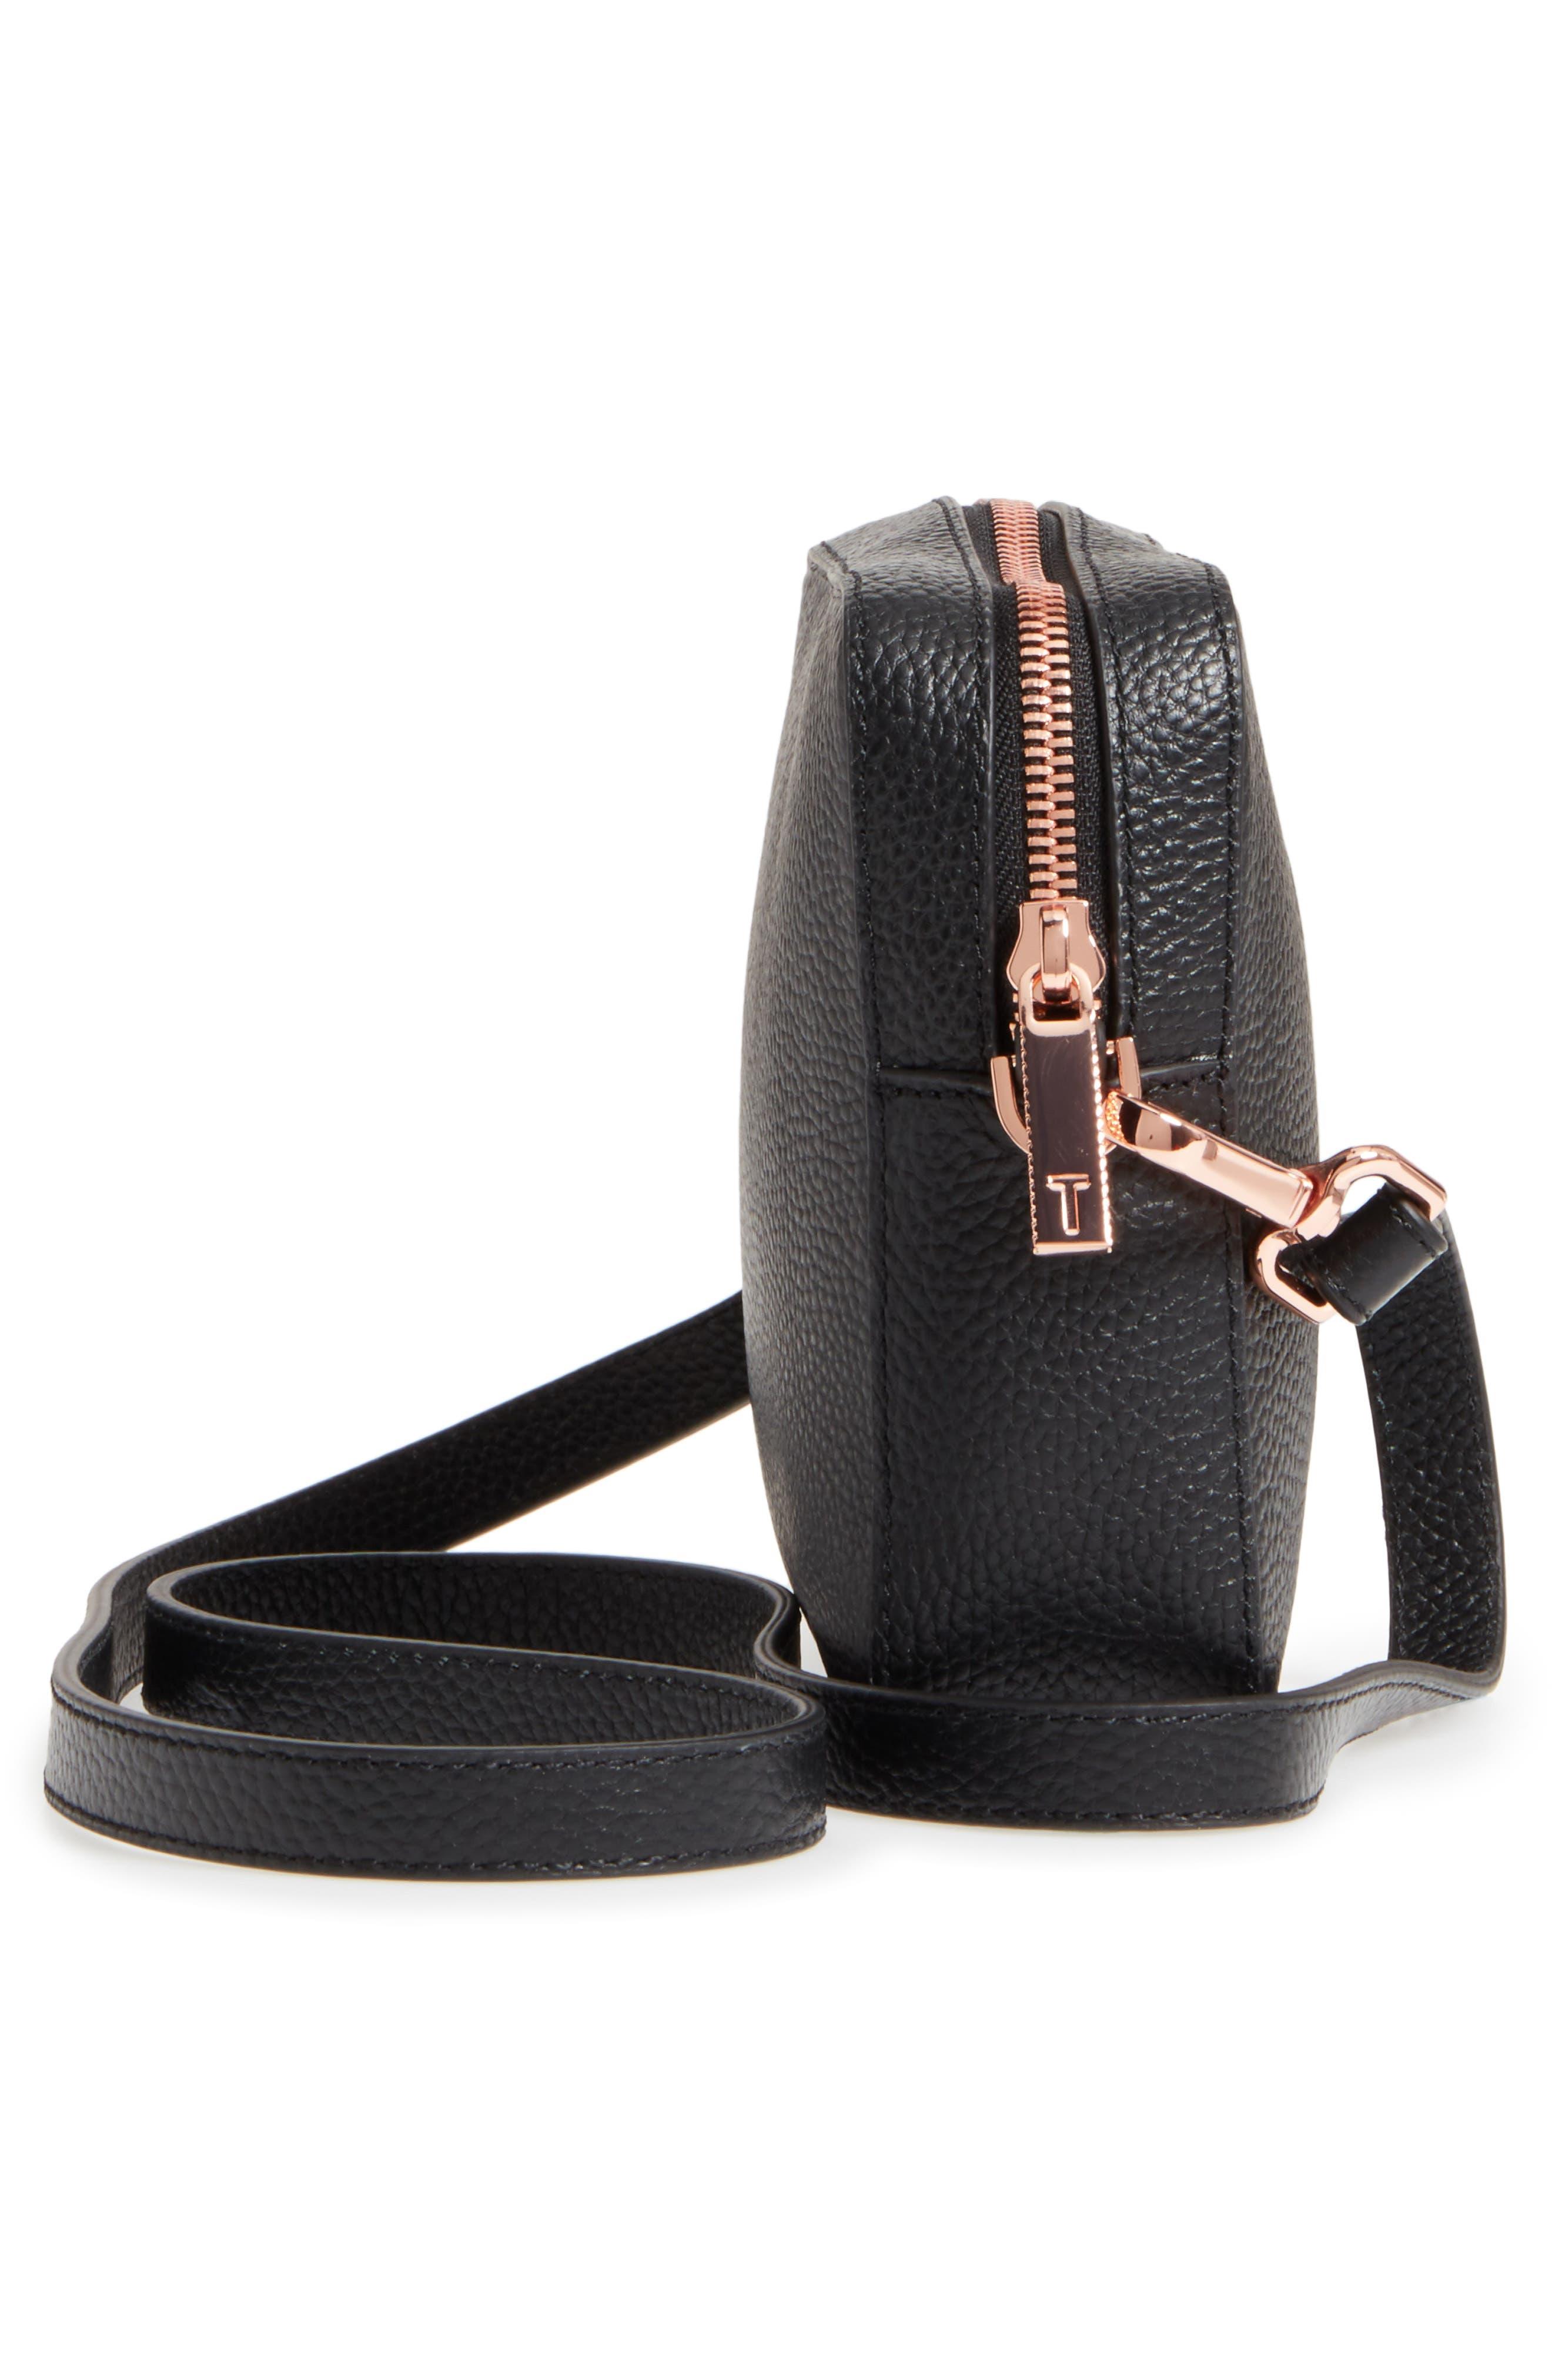 Susi Leather Crossbody Bag,                             Alternate thumbnail 5, color,                             001